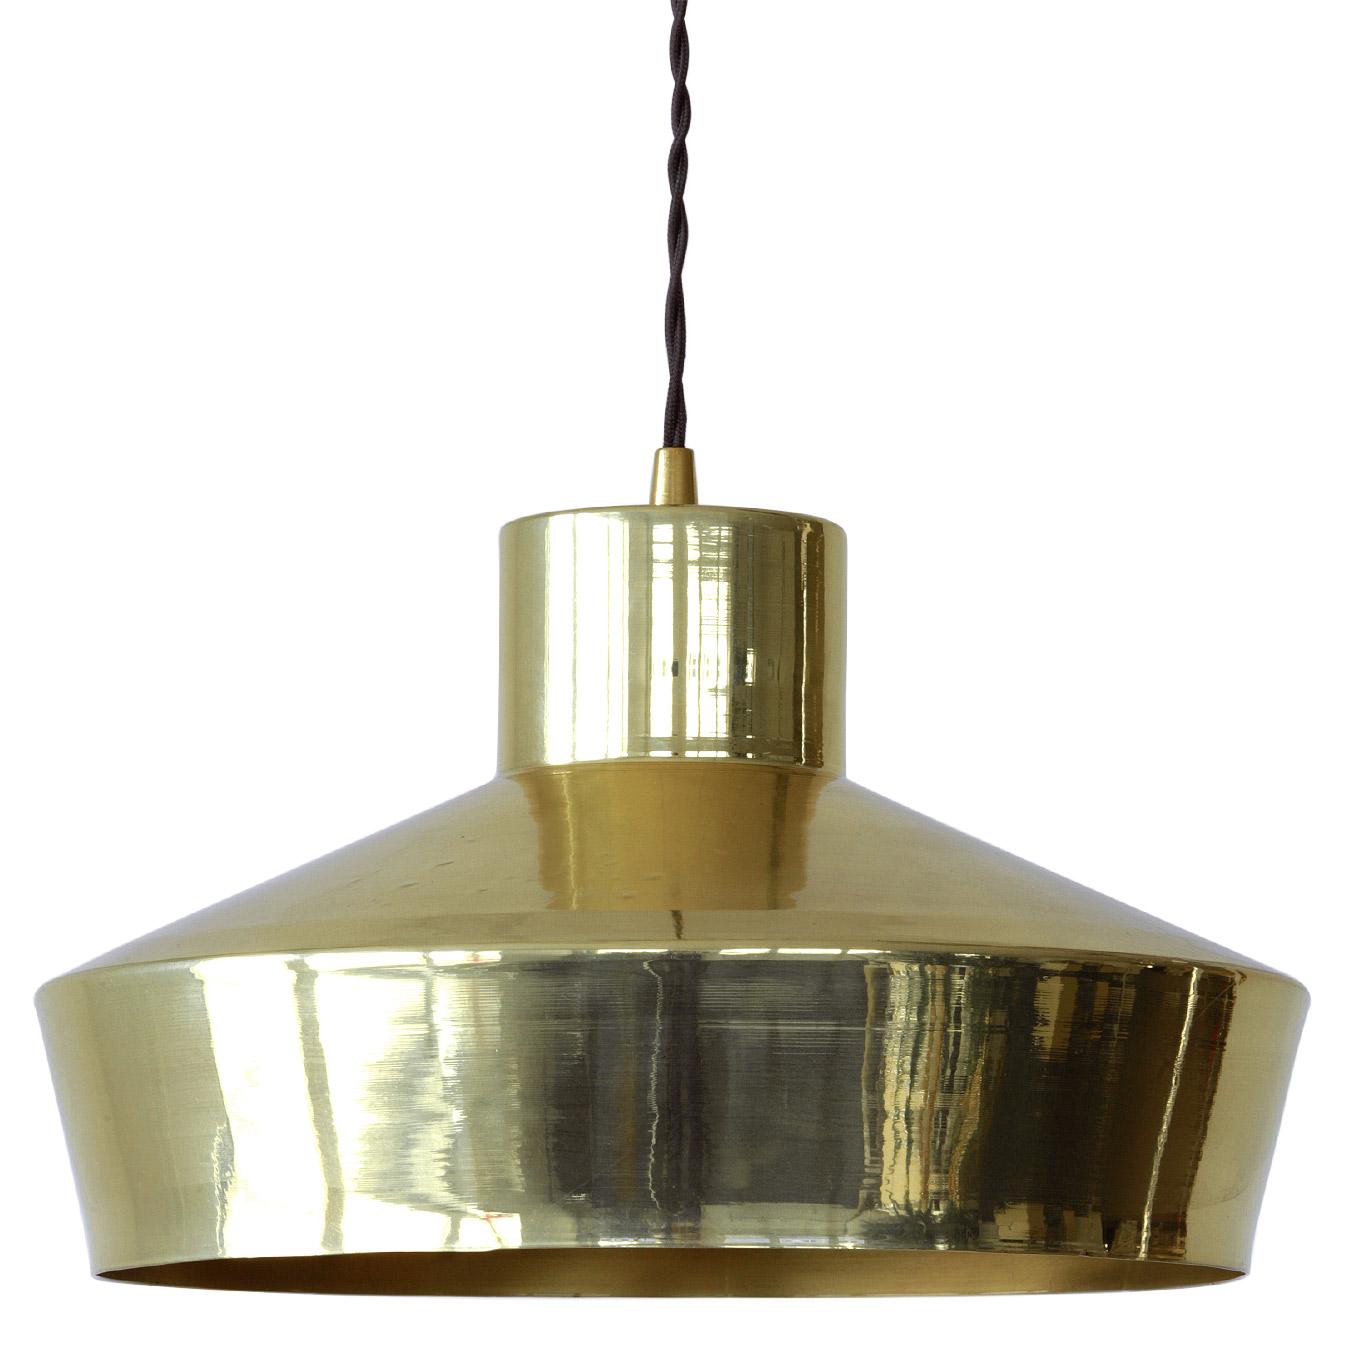 Casa Luminaire simple brass pendulum lamp from the manufactory - casa lumi